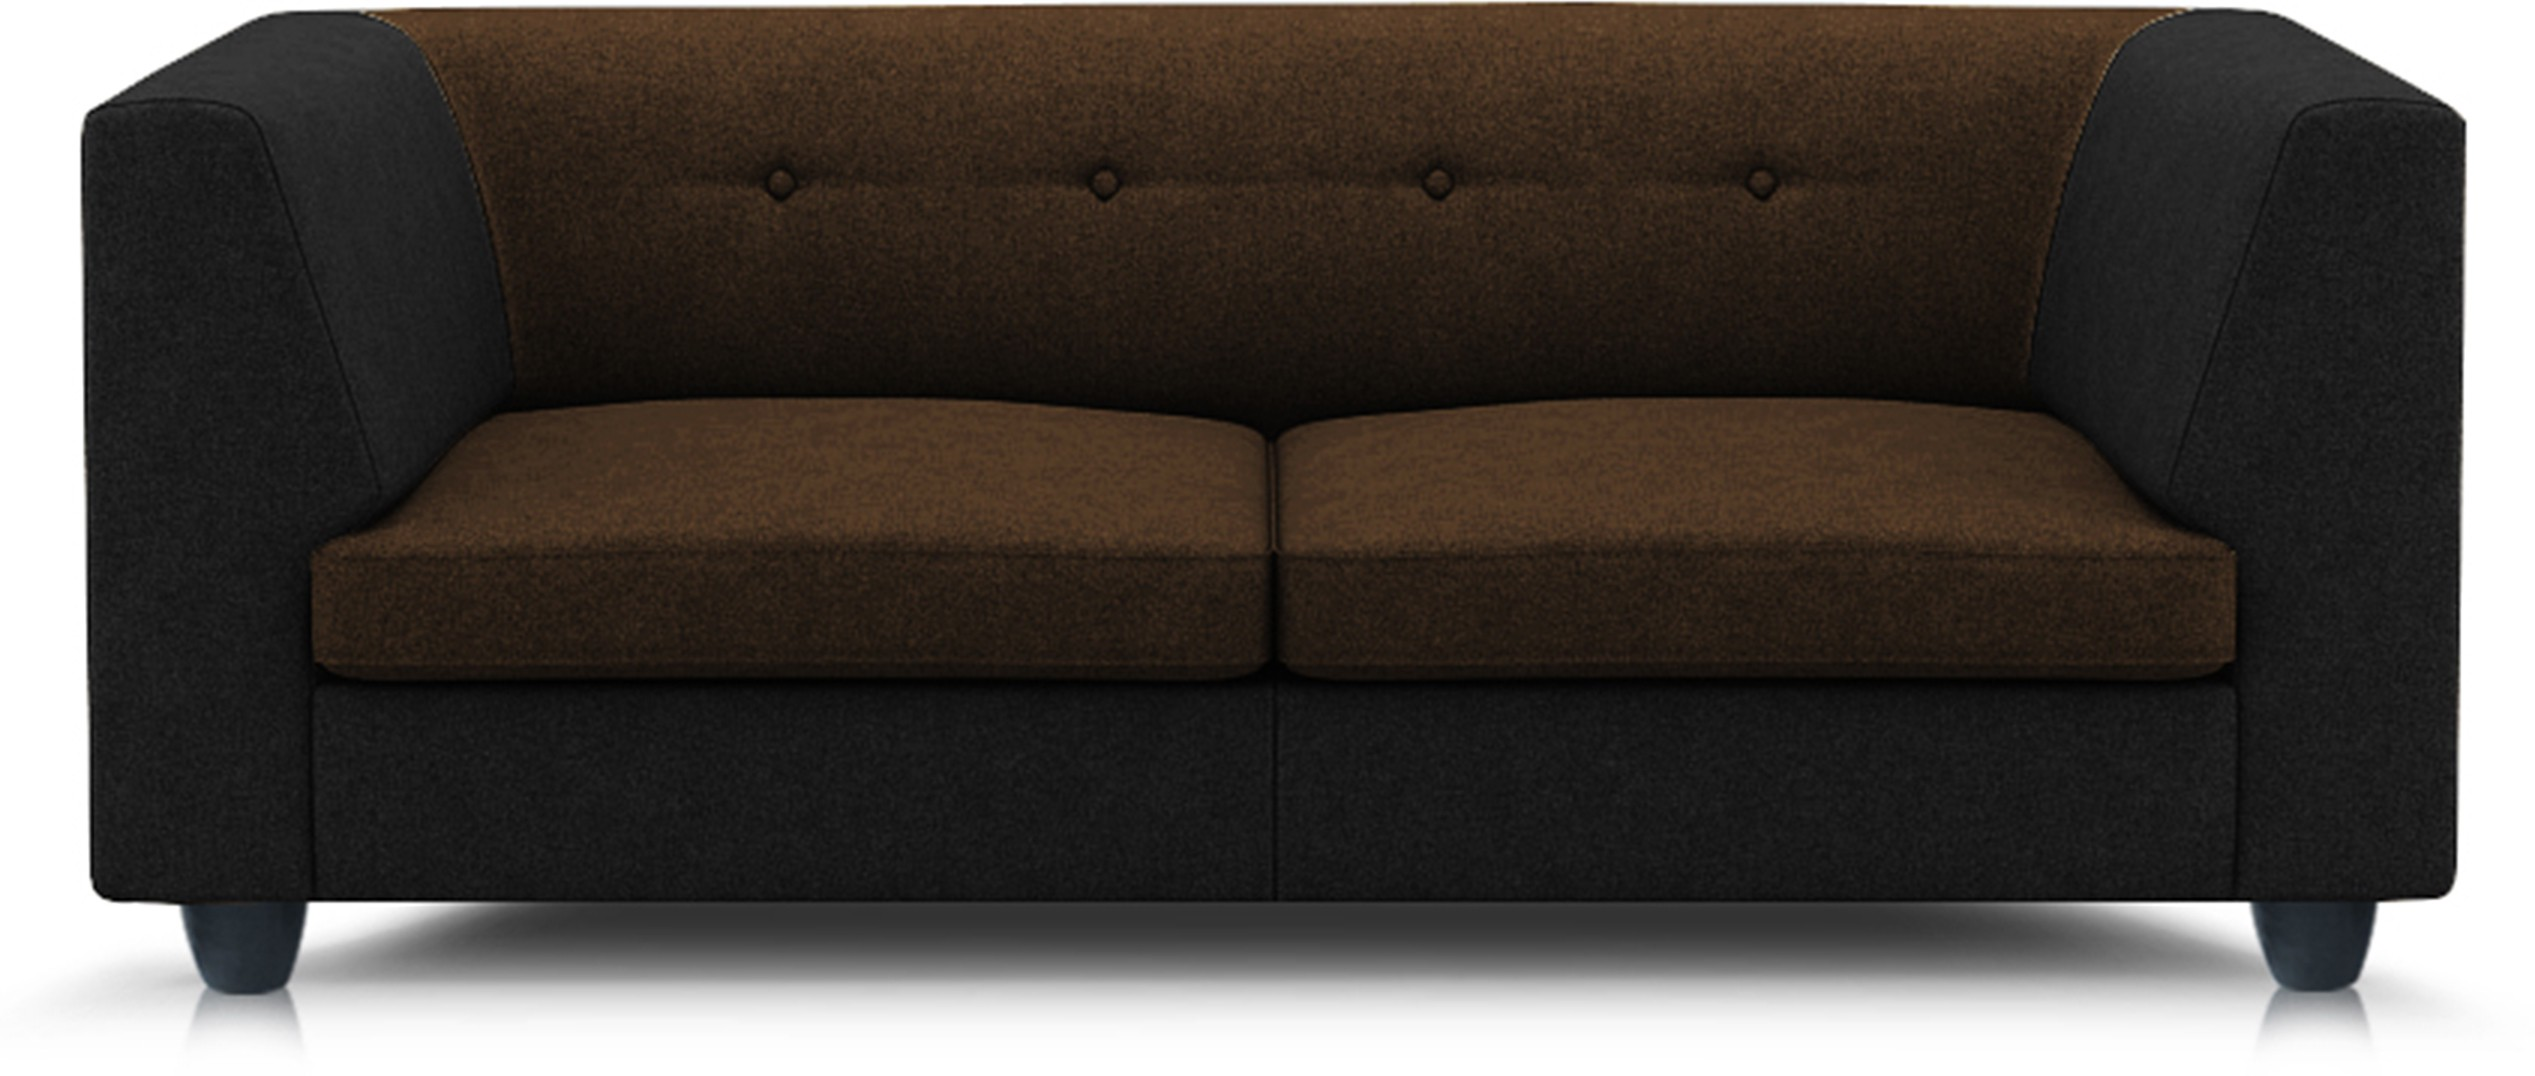 View Adorn homez Modern Solid Wood Sectional Multi Sofa Set Furniture (Adorn homez)